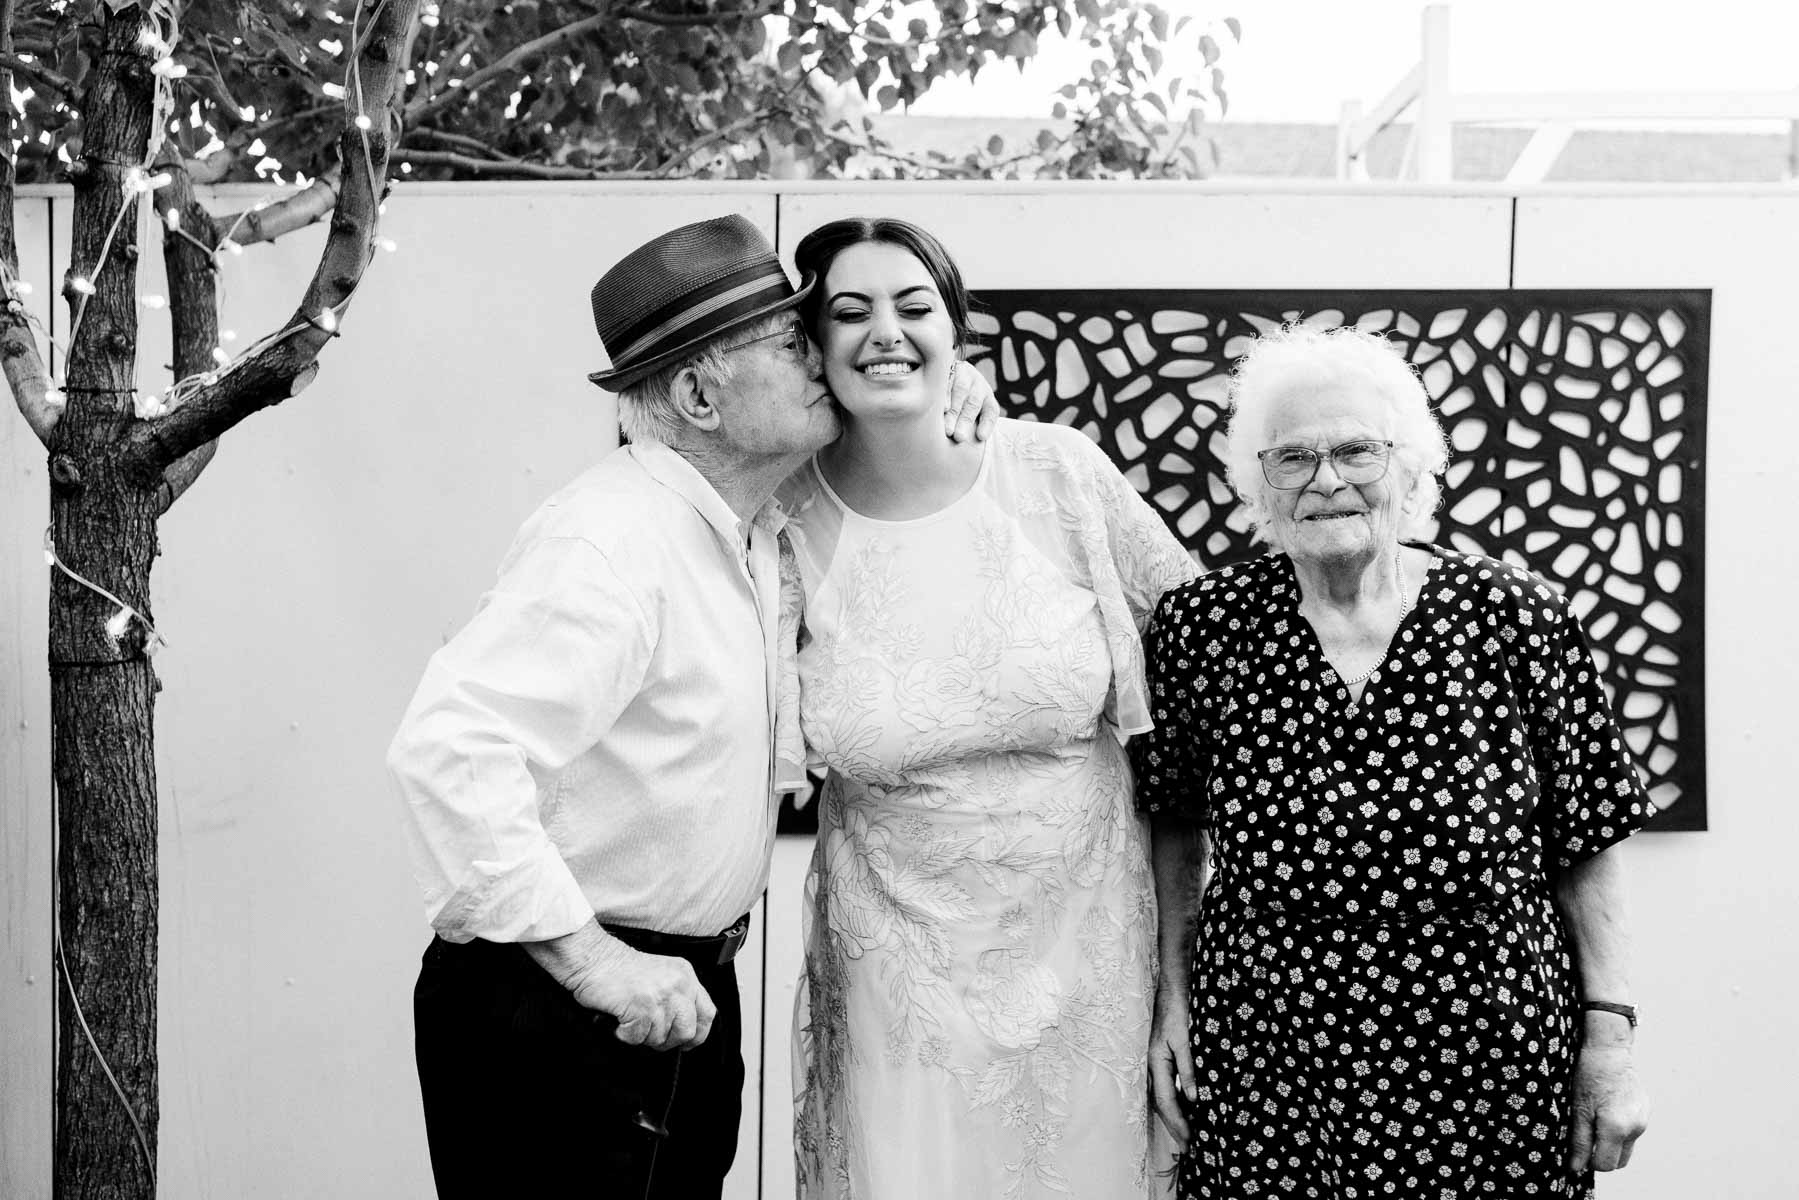 little-henri-cafe-wedding-thornbury-heart+soul-weddings-jane-aaron-05932.jpg